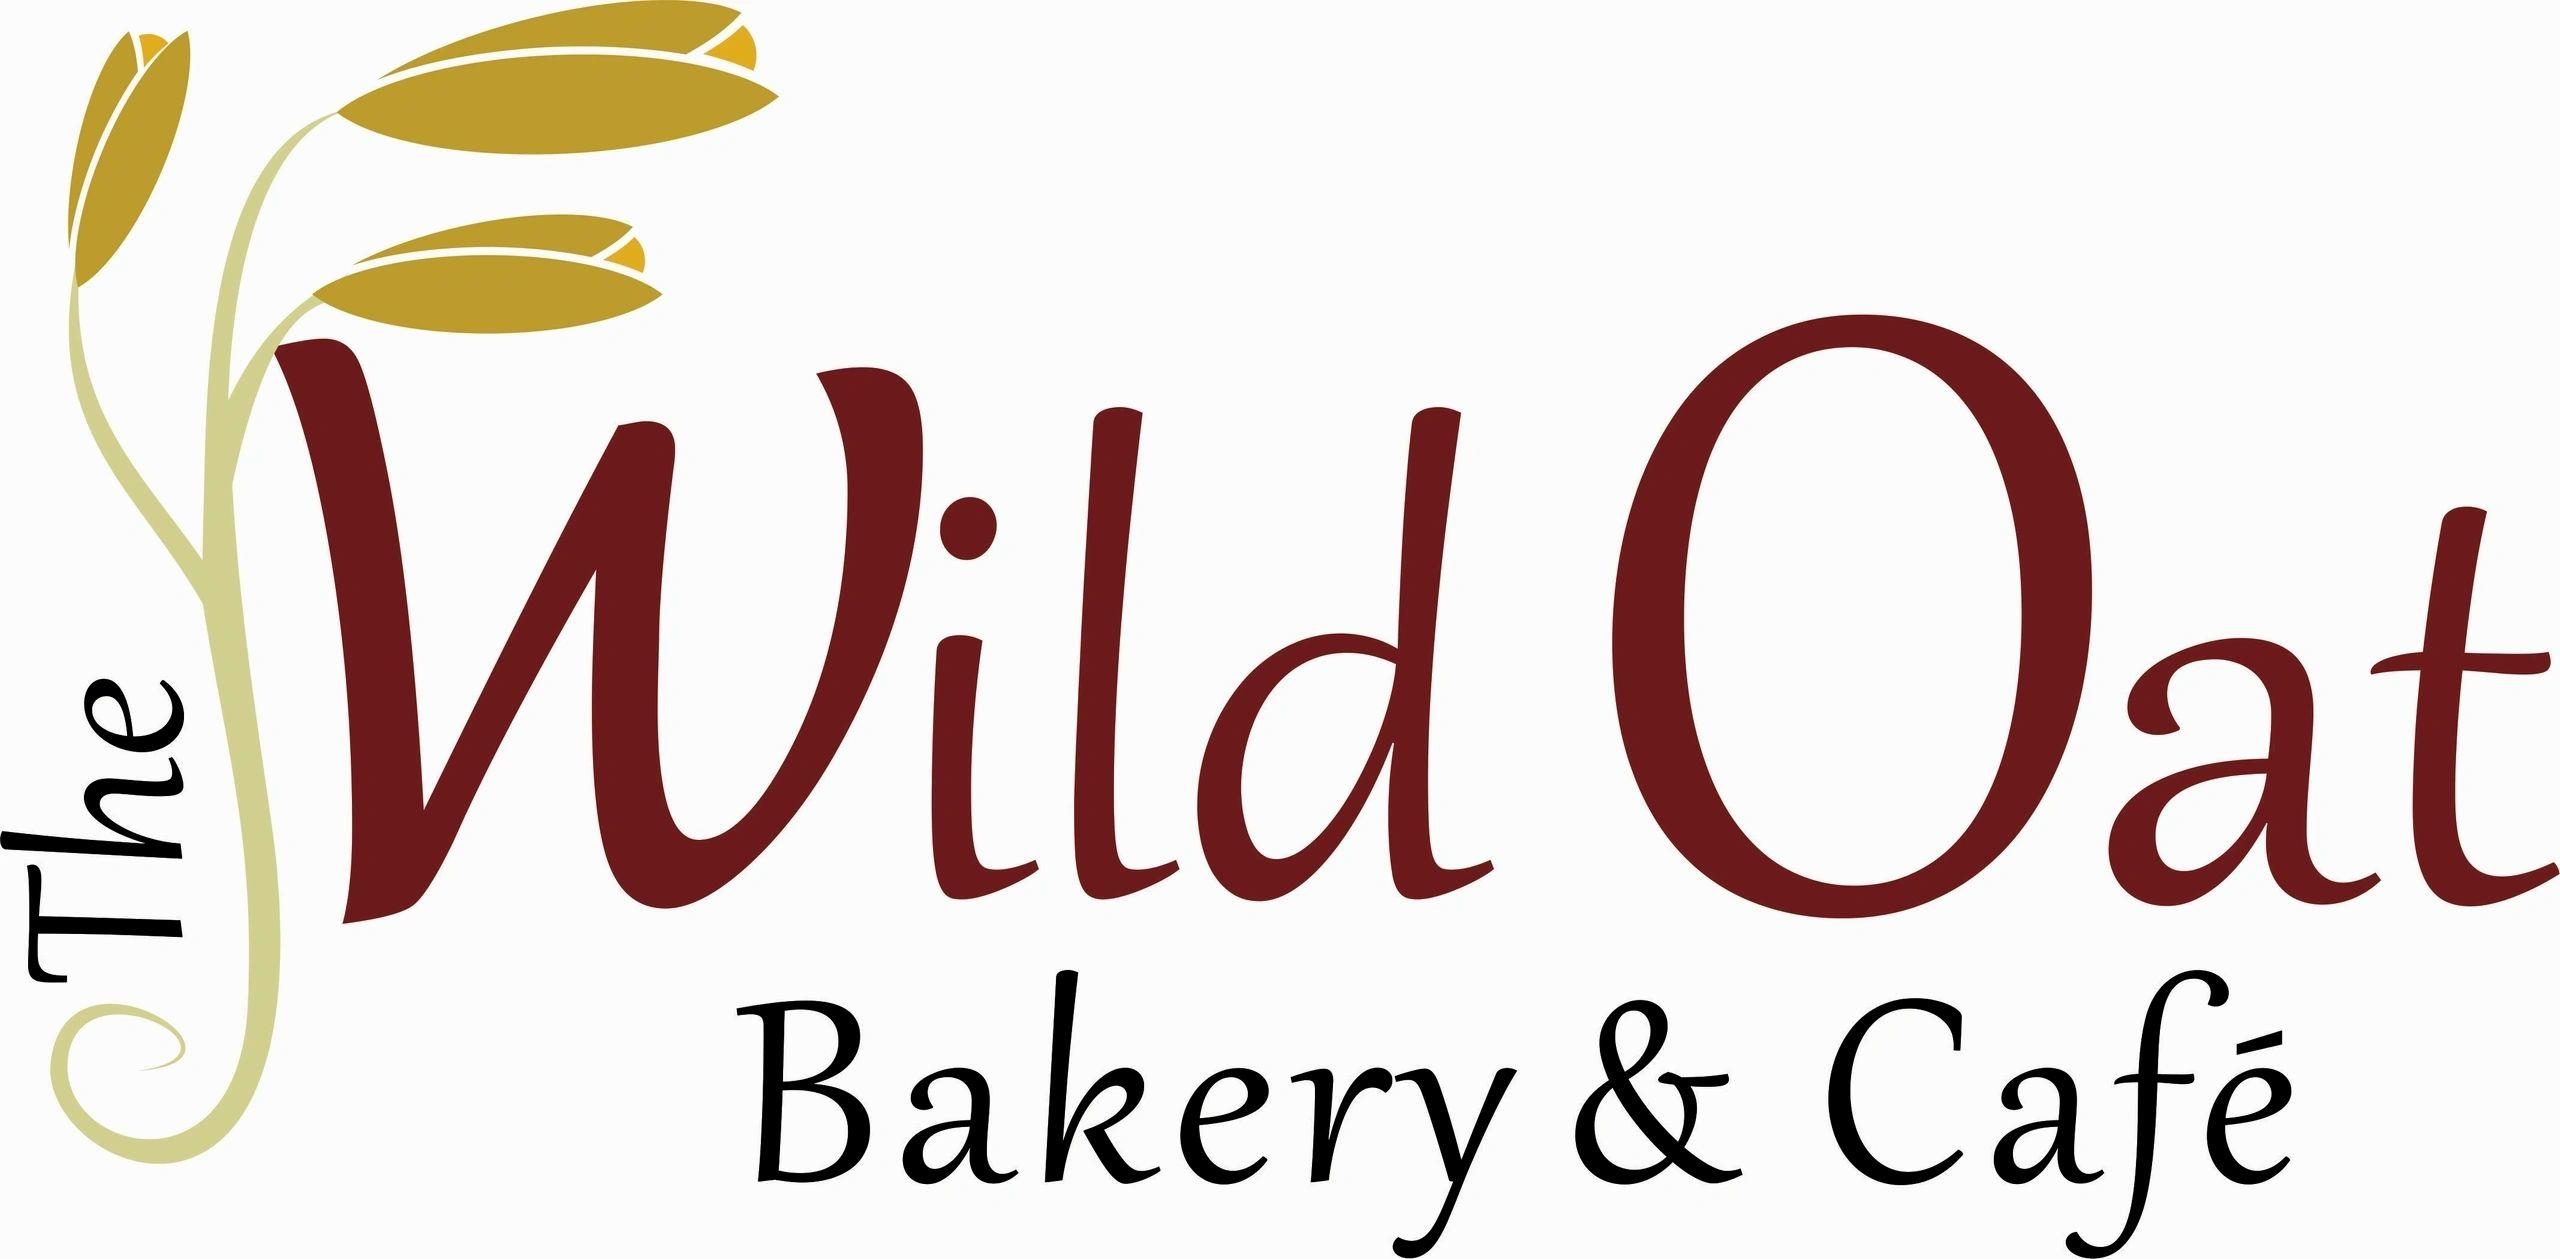 The Wild Oat Bakery & Cafe logo